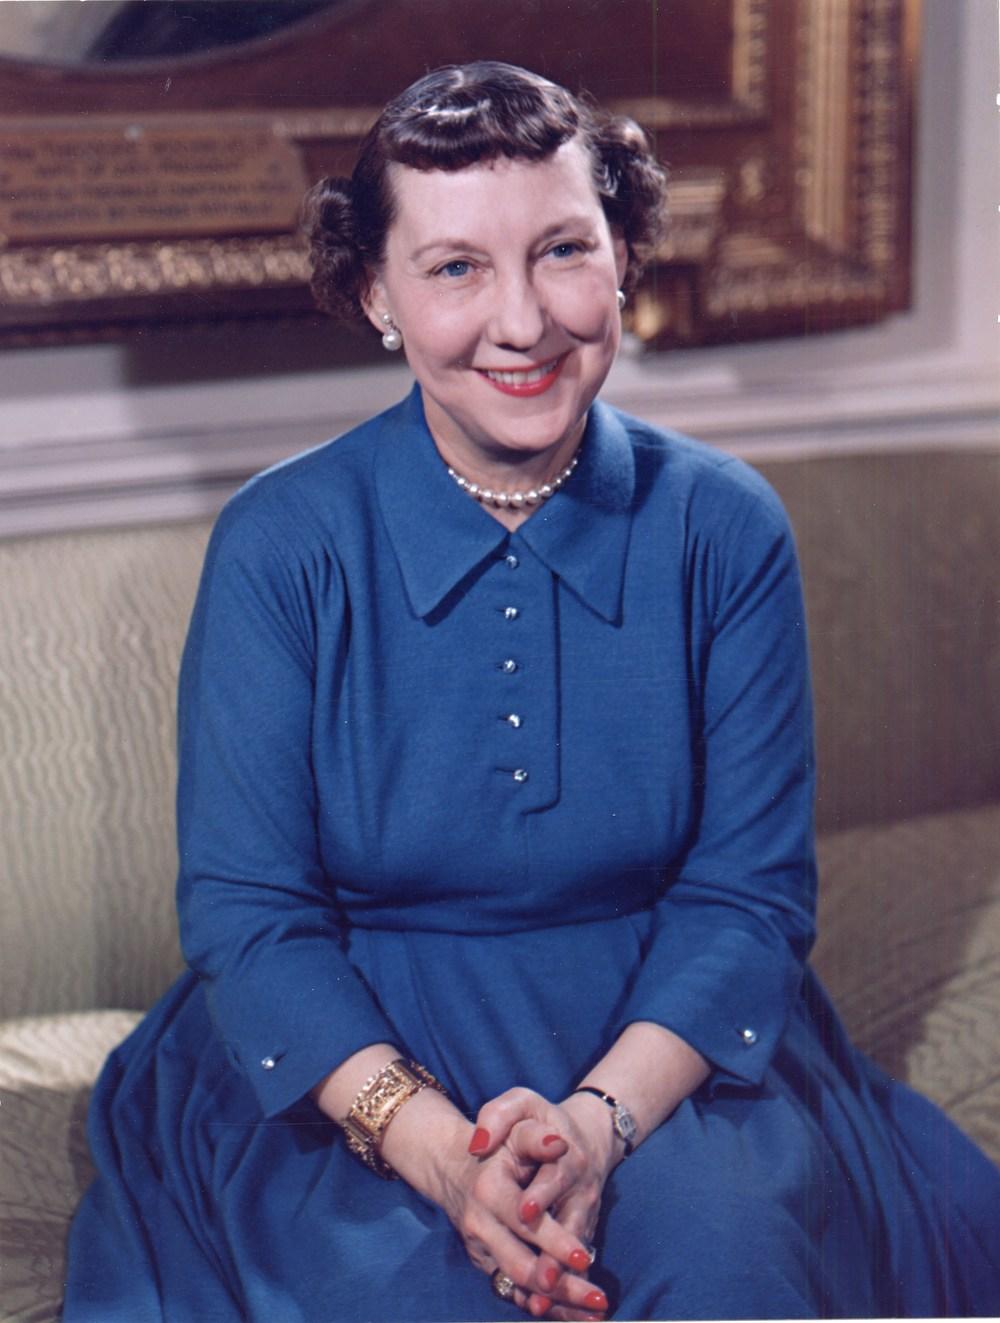 Mamie Eisenhower, 1954